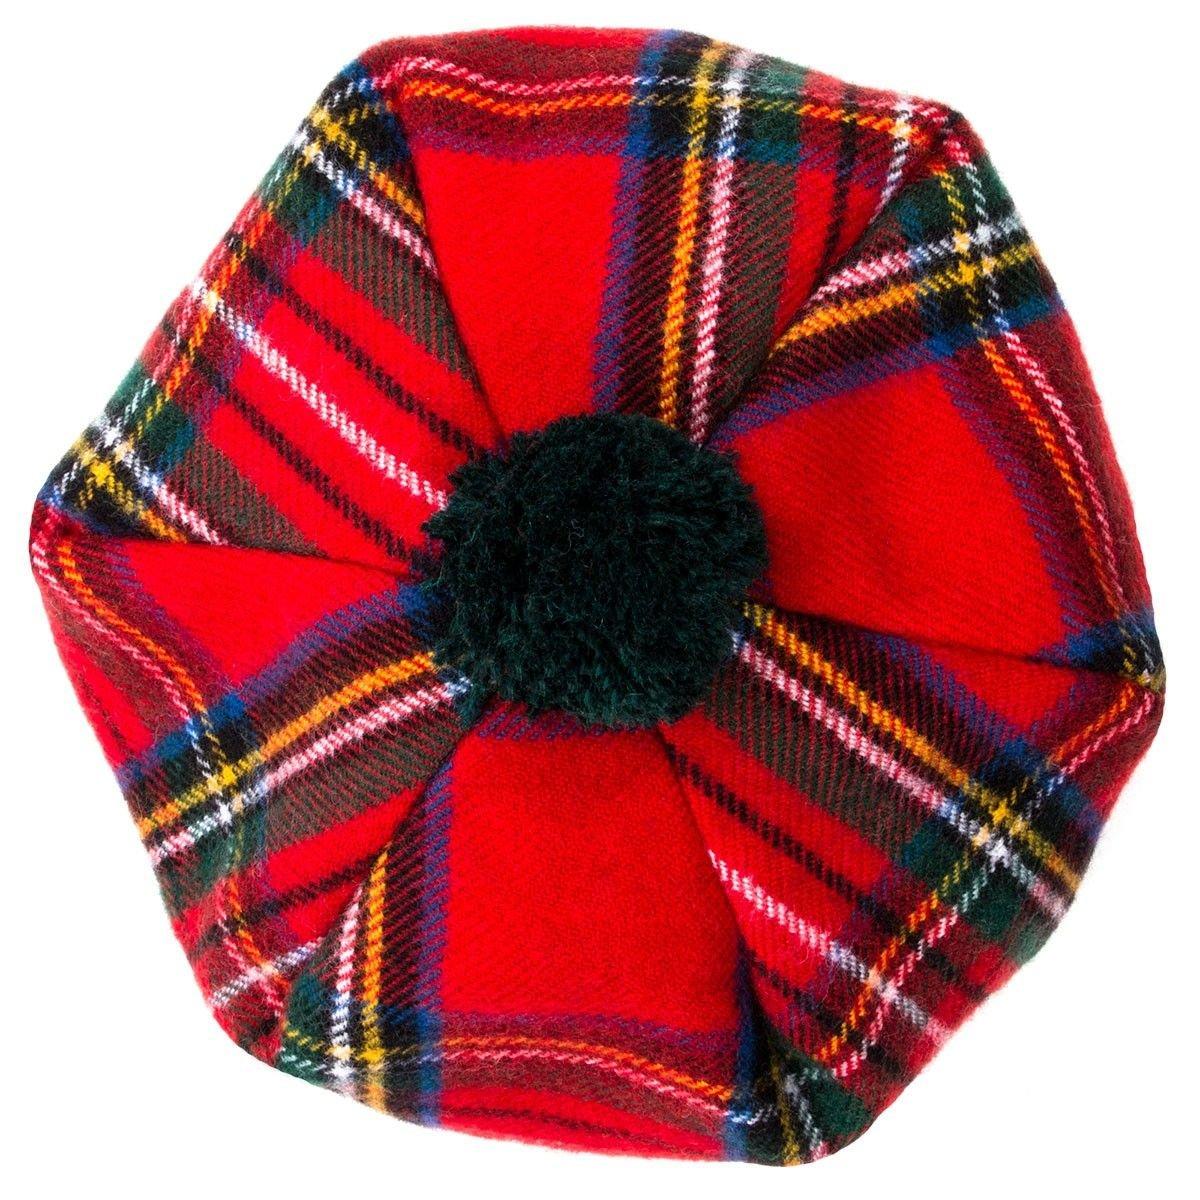 Oxfords Cashmere Scottish Tam with PomPom. Royal Stewart by Oxfords Cashmere (Image #1)